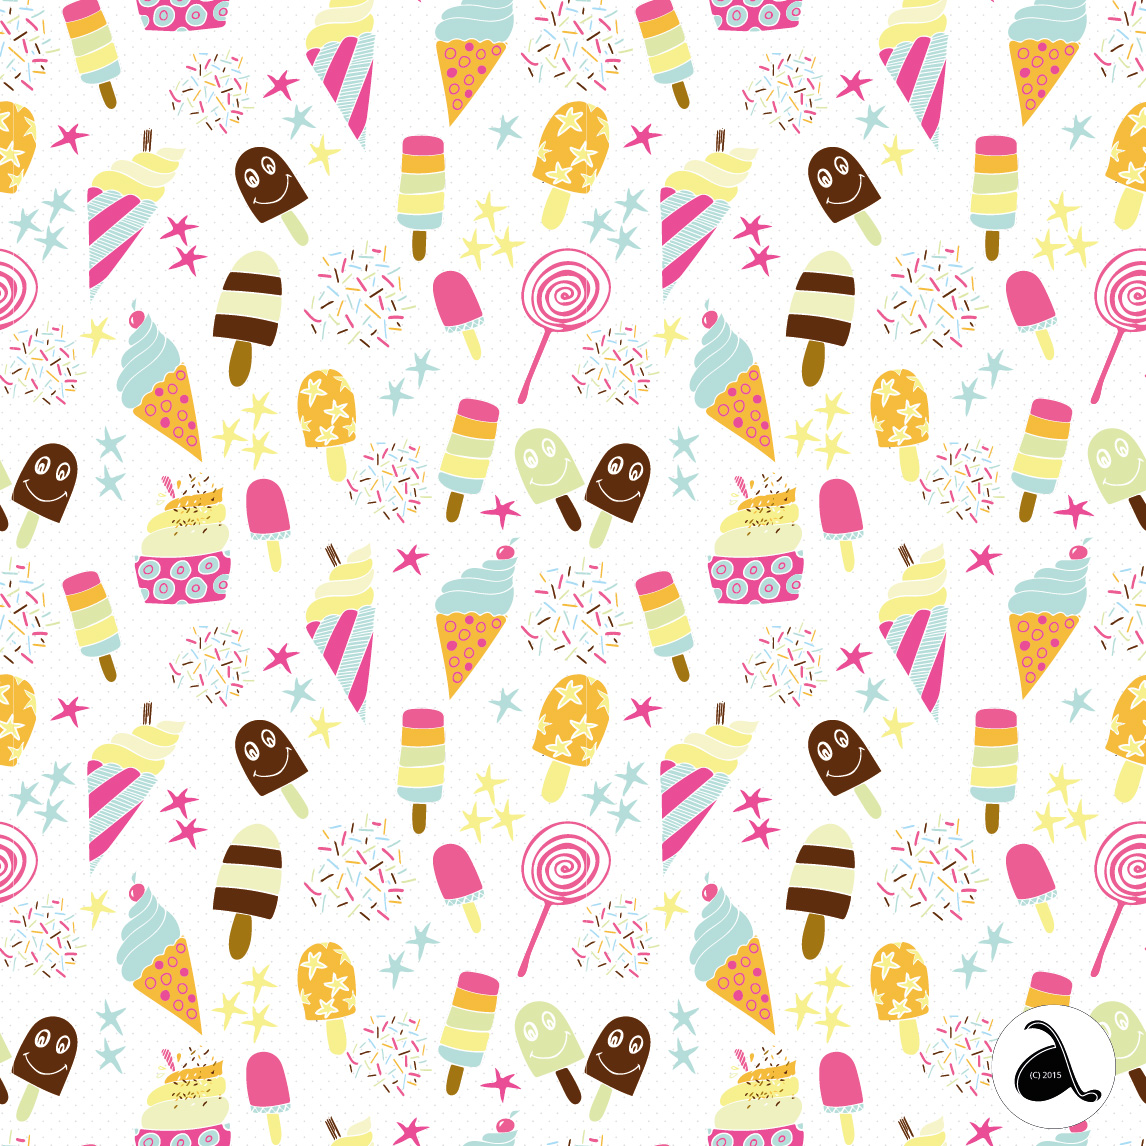 My Favorite Ice Creams